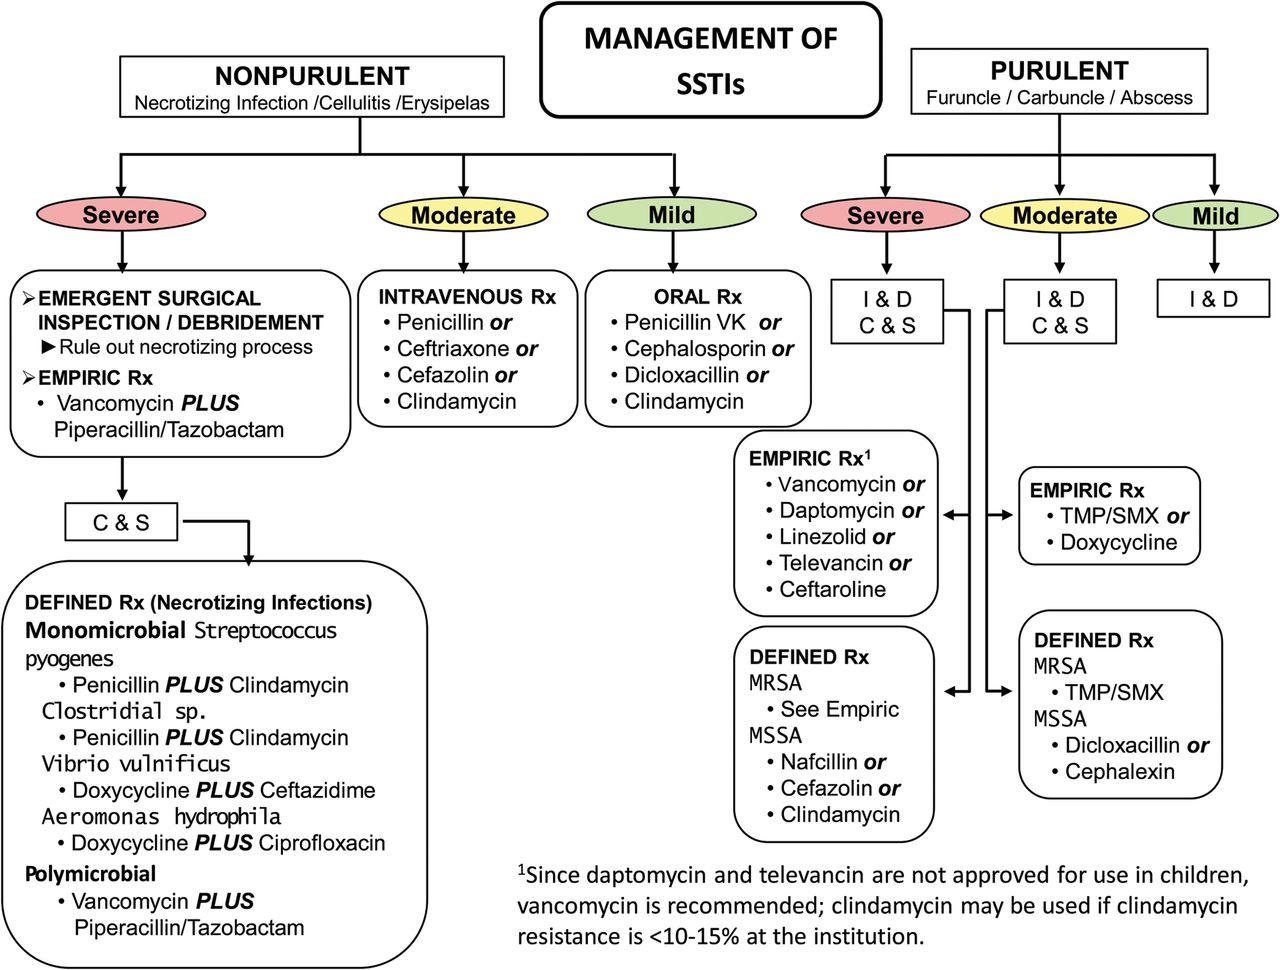 abscess2_chart?w=825 skin & soft tissue infections national urban survivors union